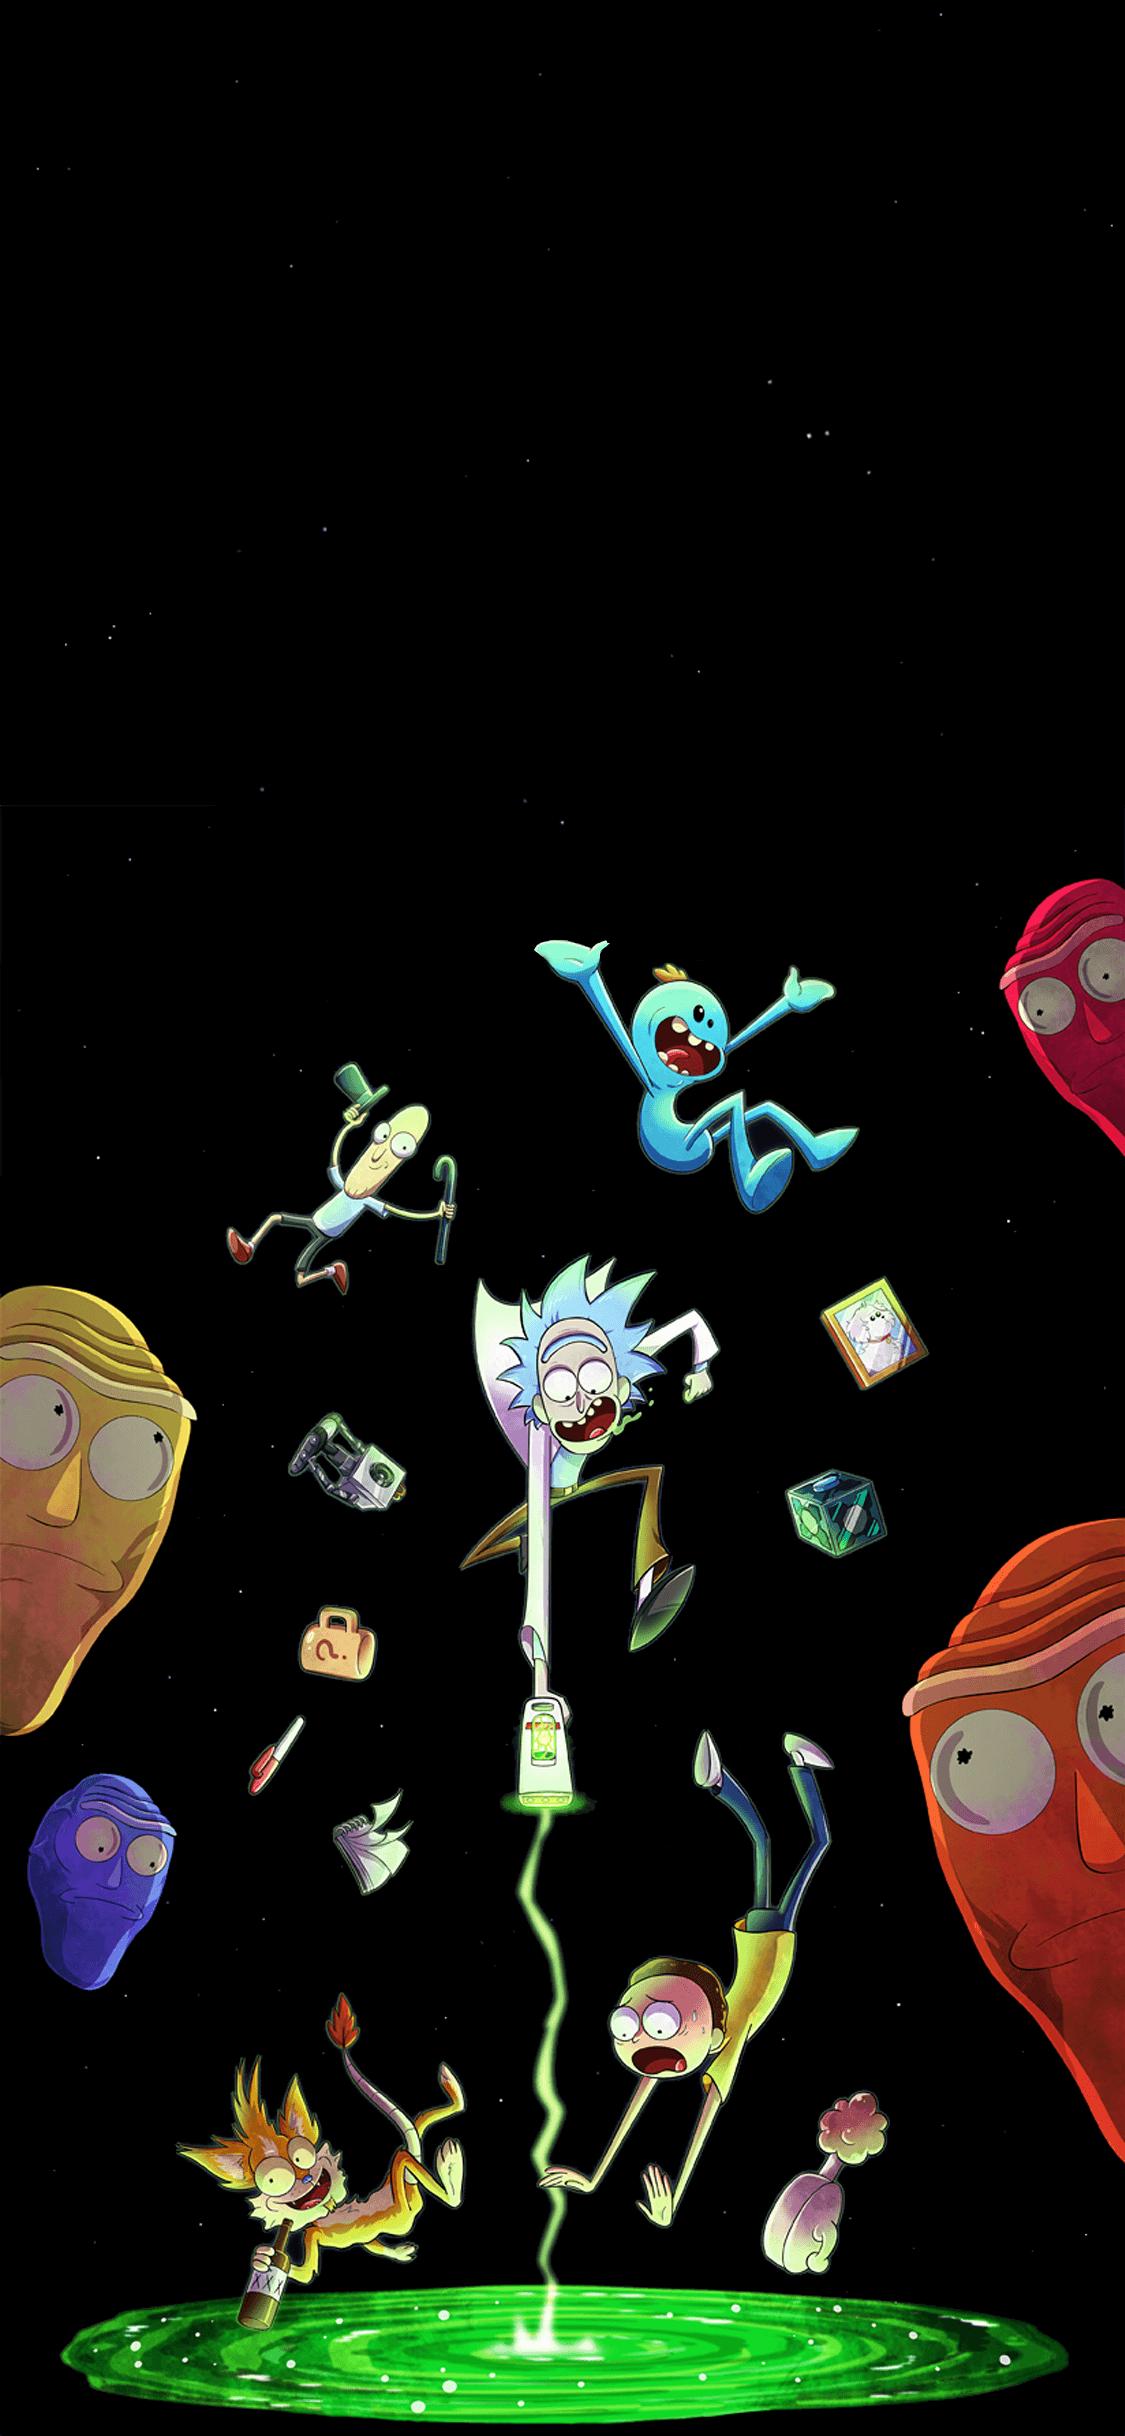 Rick and Morty Windows 10 Theme - ExpoThemes